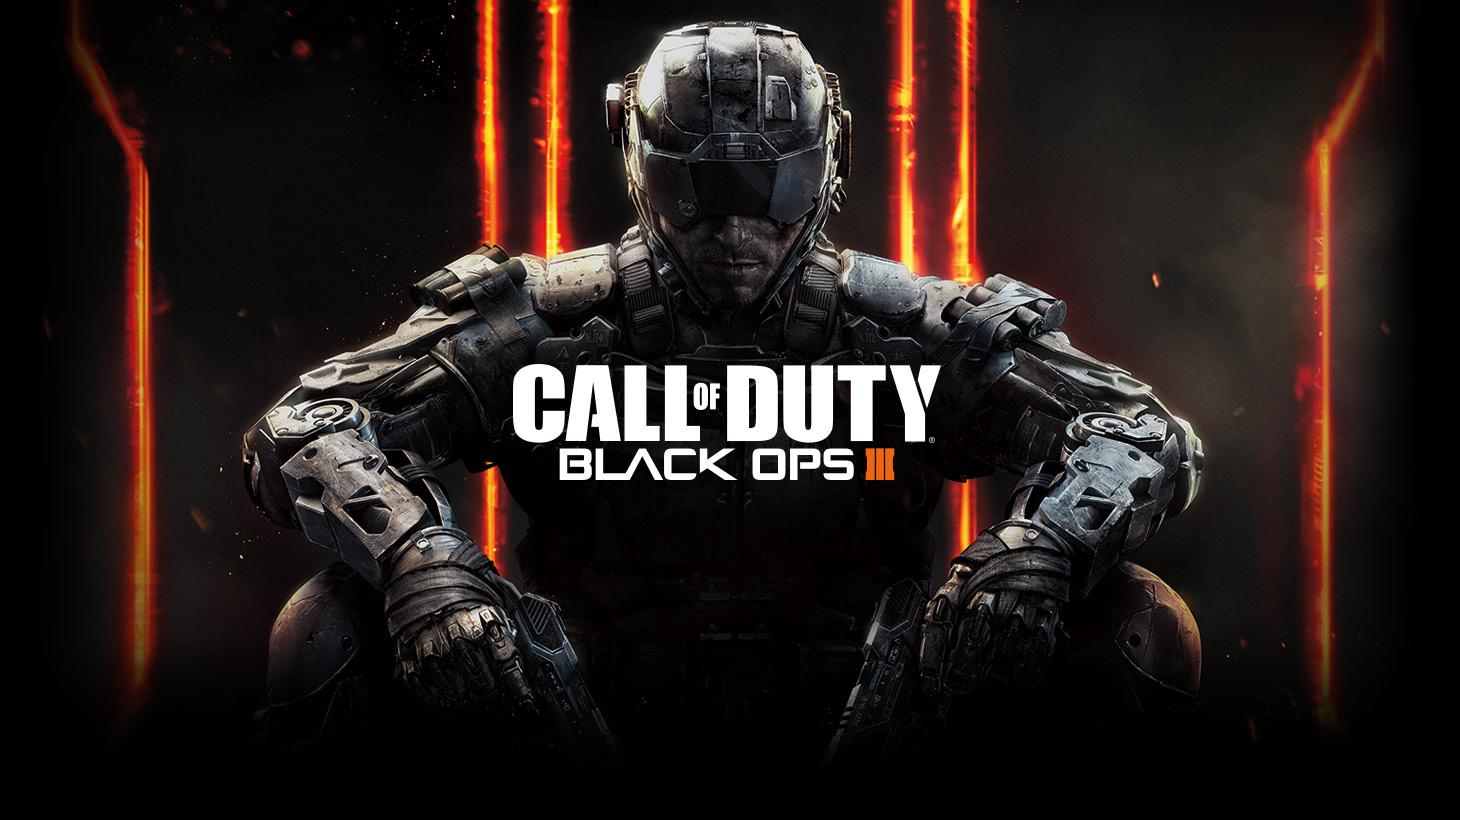 Call of Duty Black Ops III Downloads Xbox 1460x820